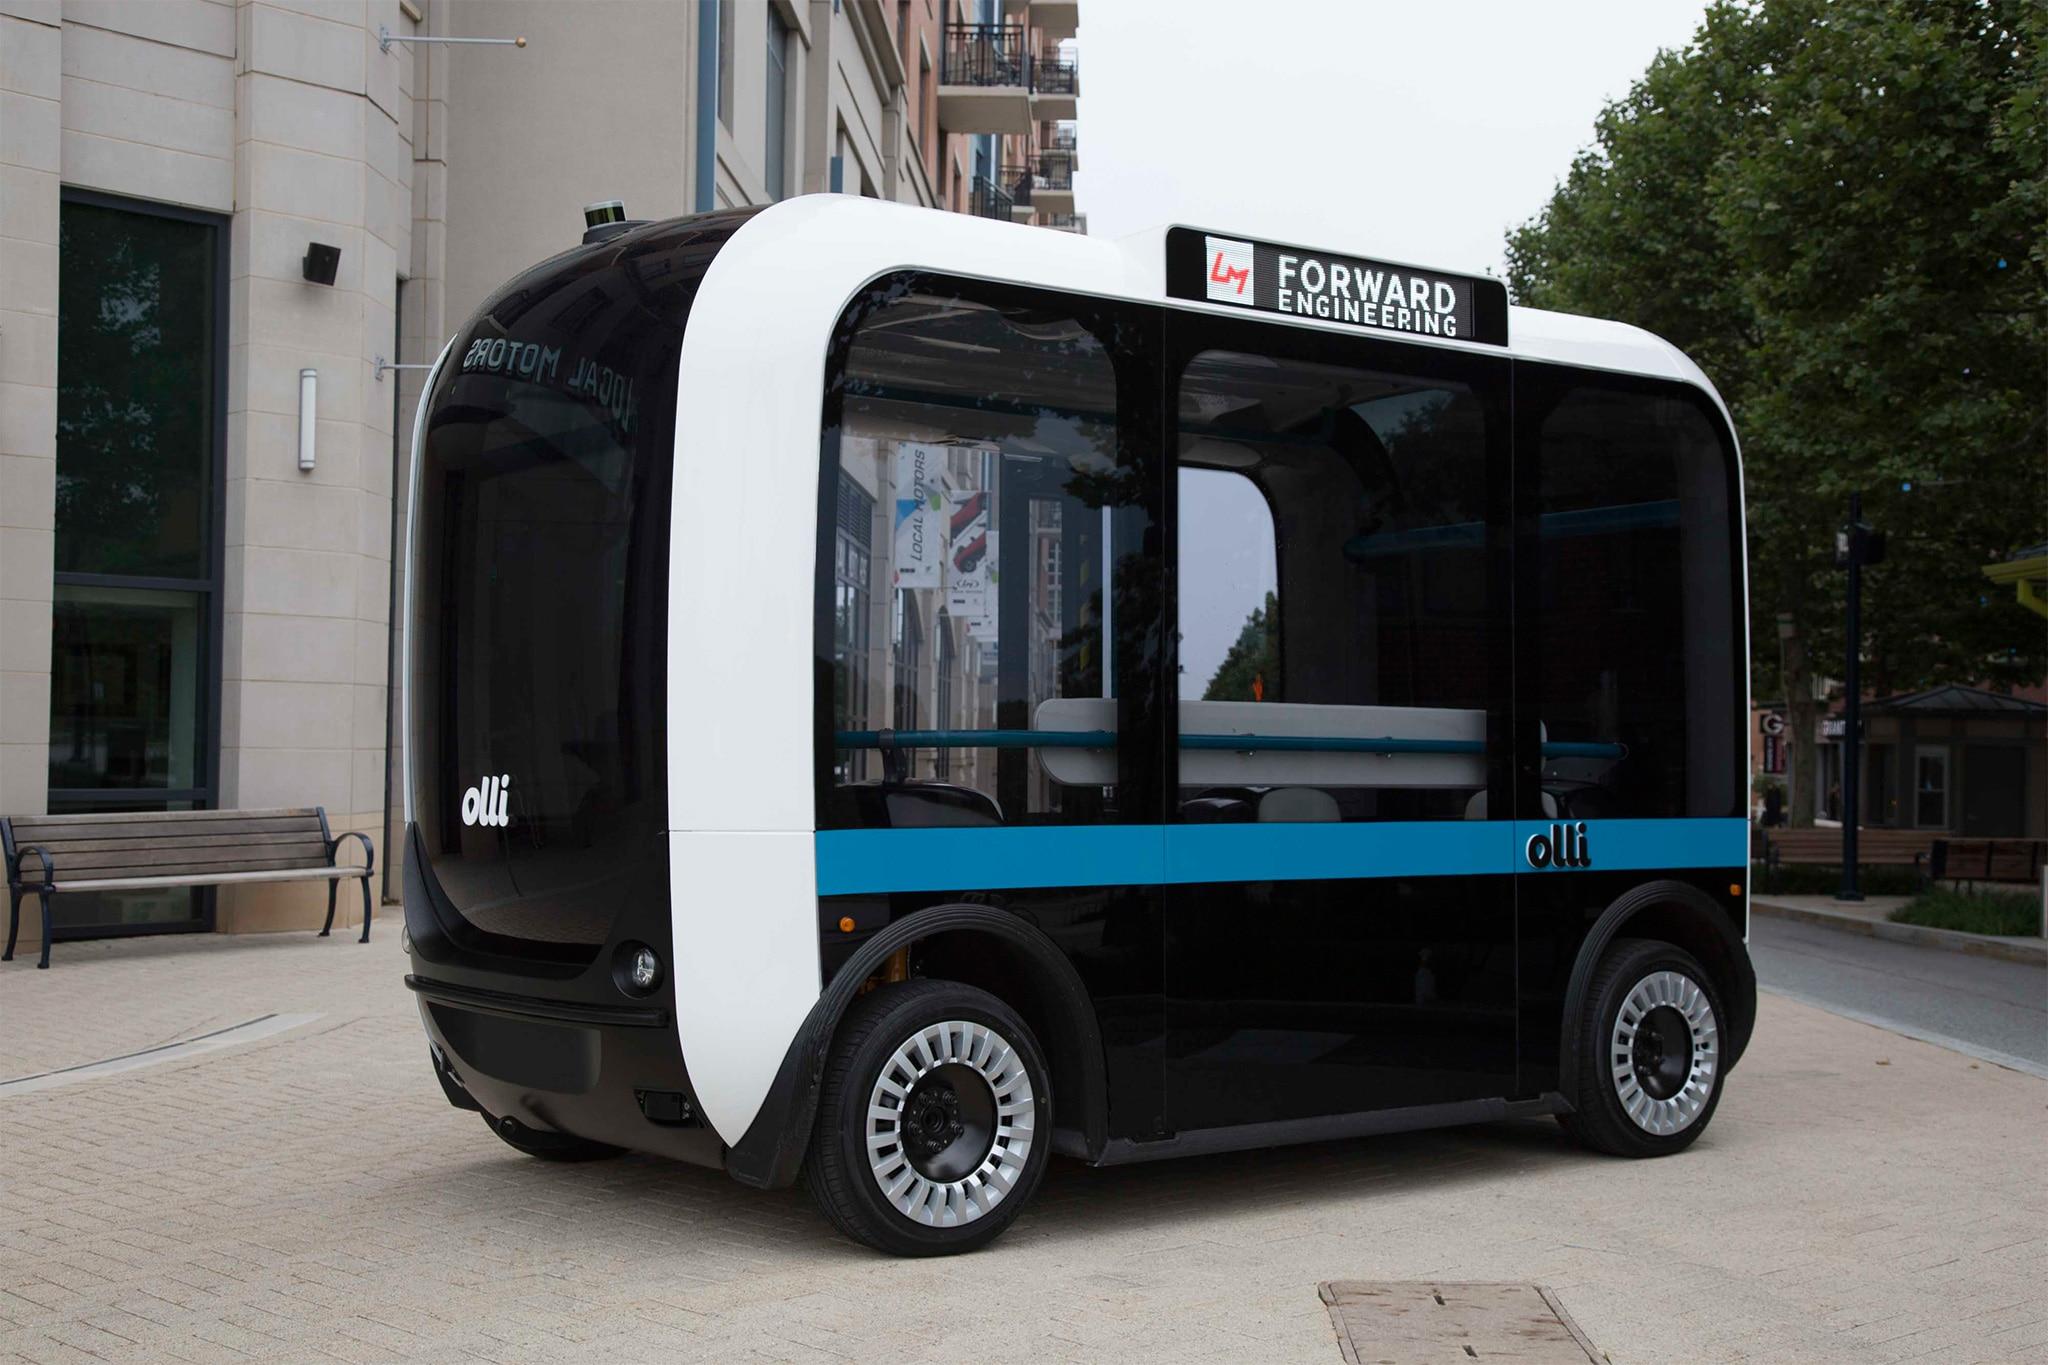 3d Revolution Local Motors Wants To Print You A Car You